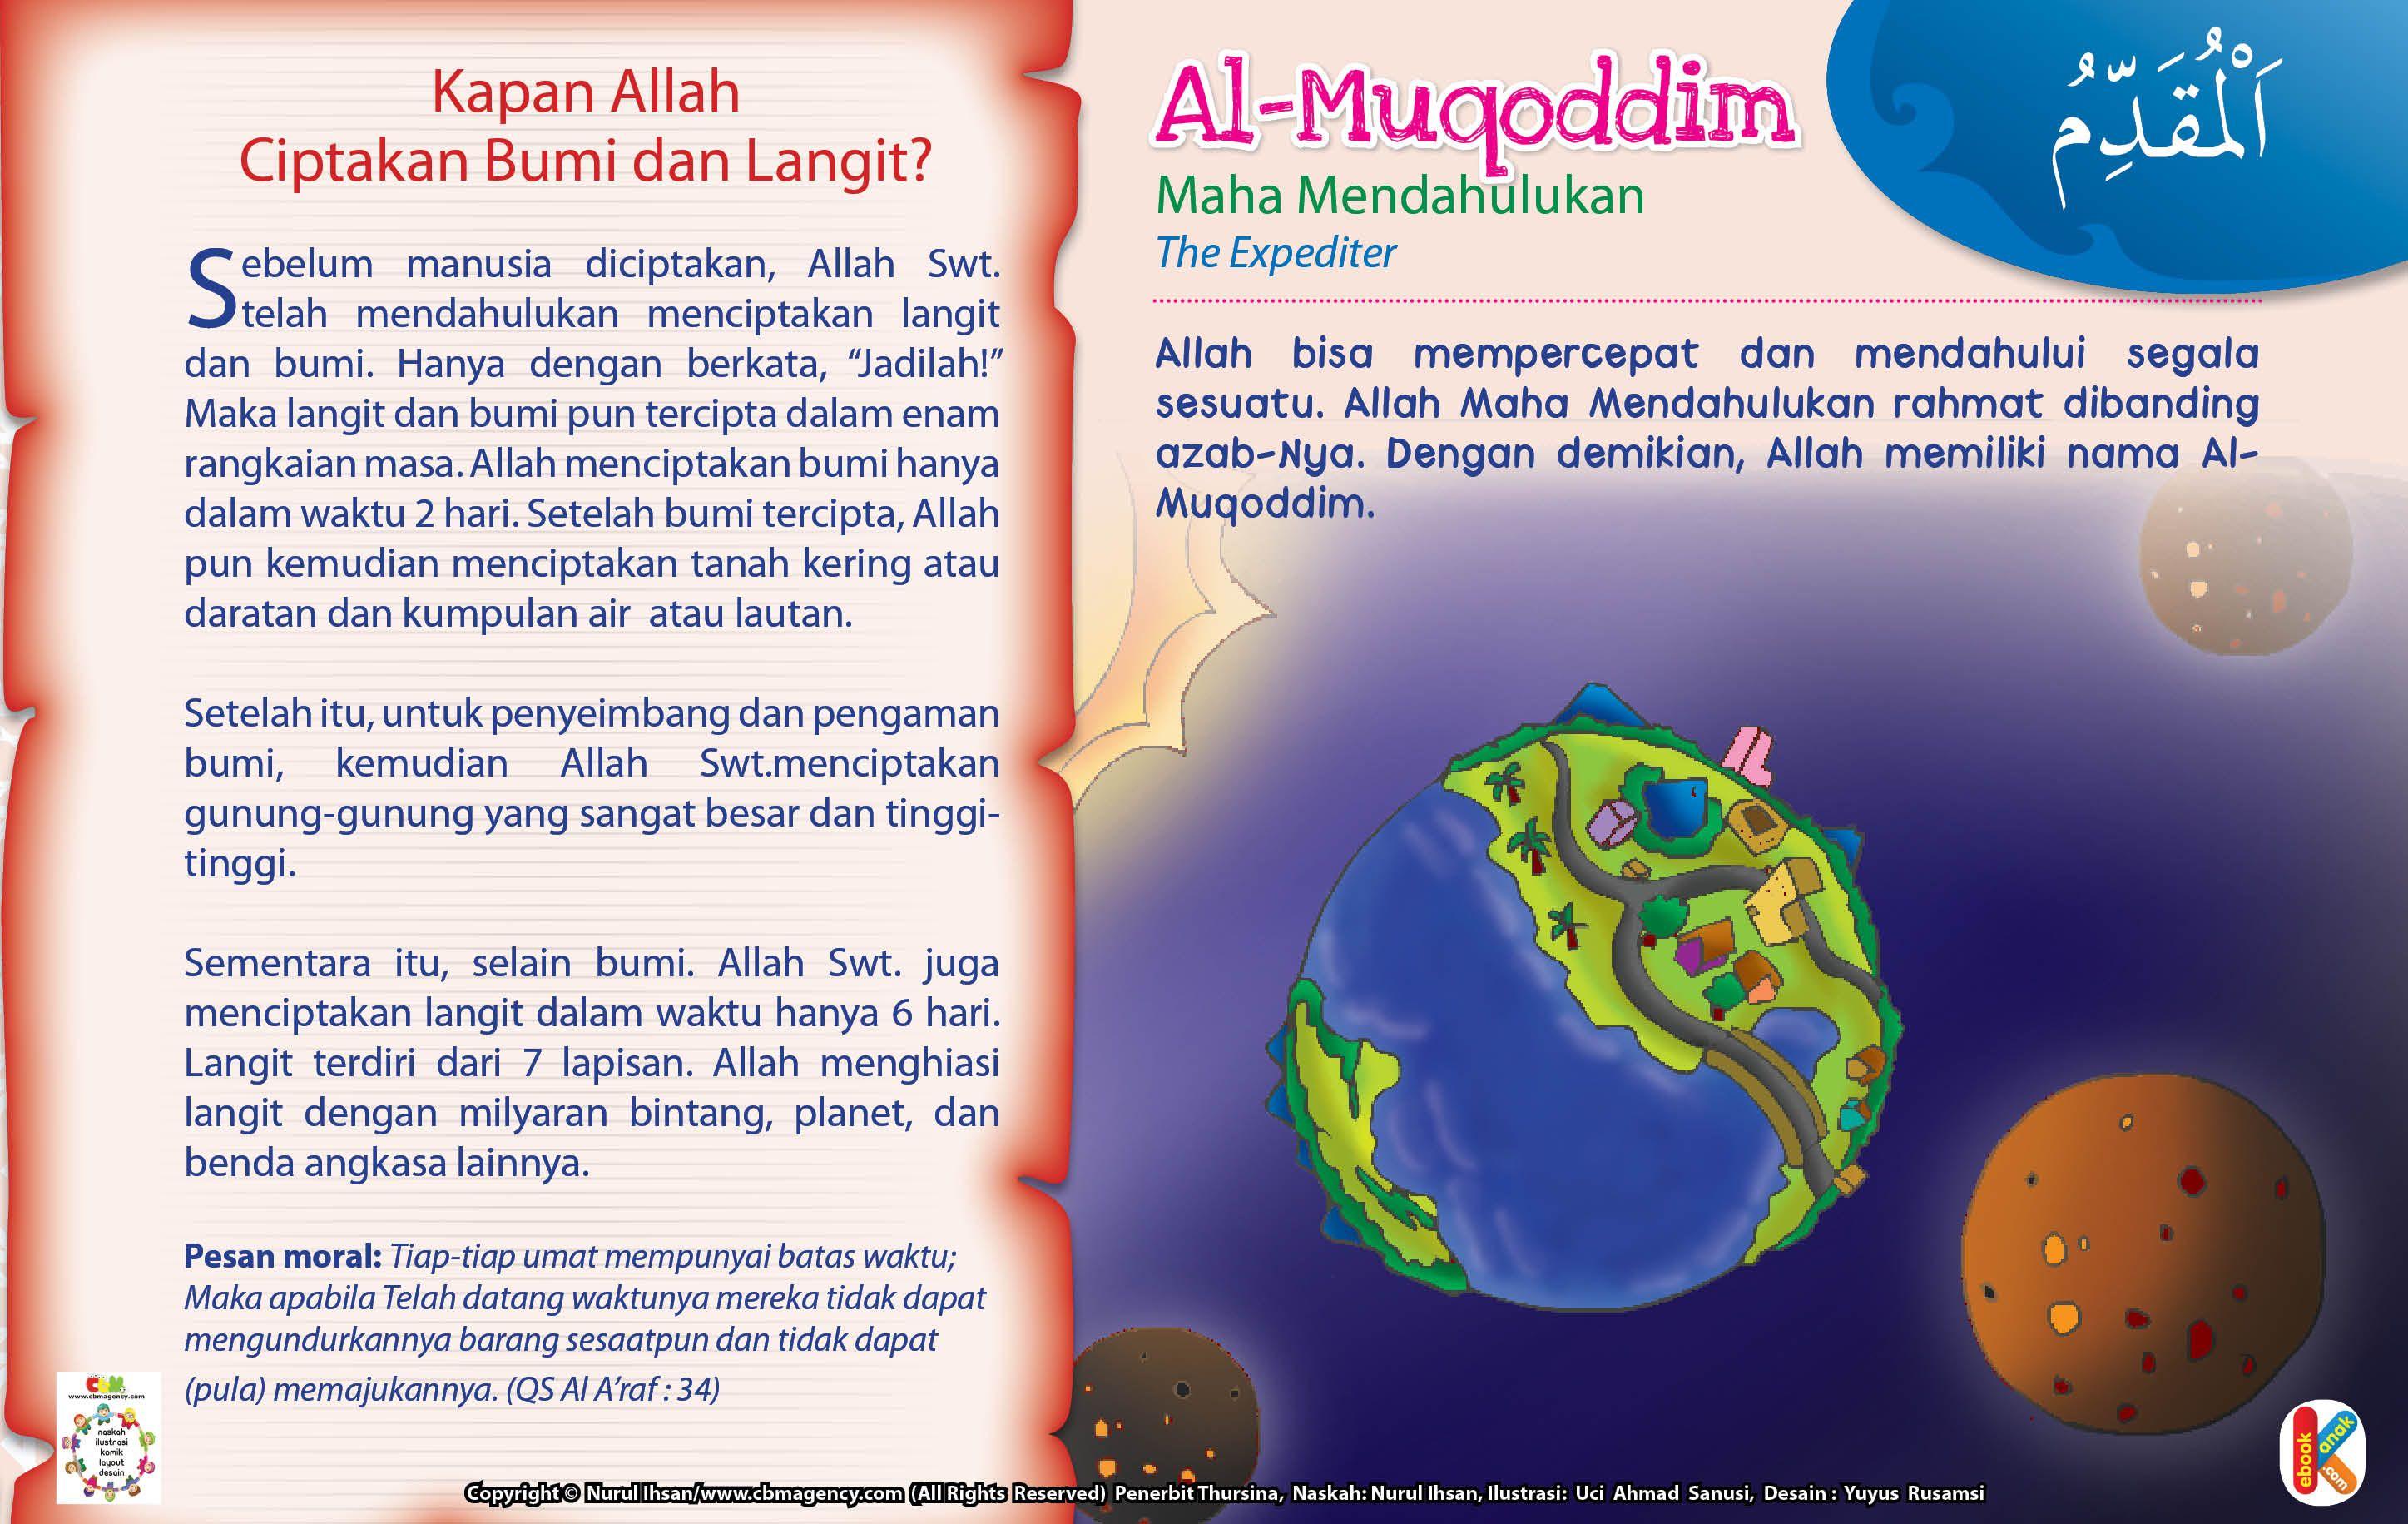 Kisah Asma'ul Husna AlMuqoddim (Dengan gambar) Anak